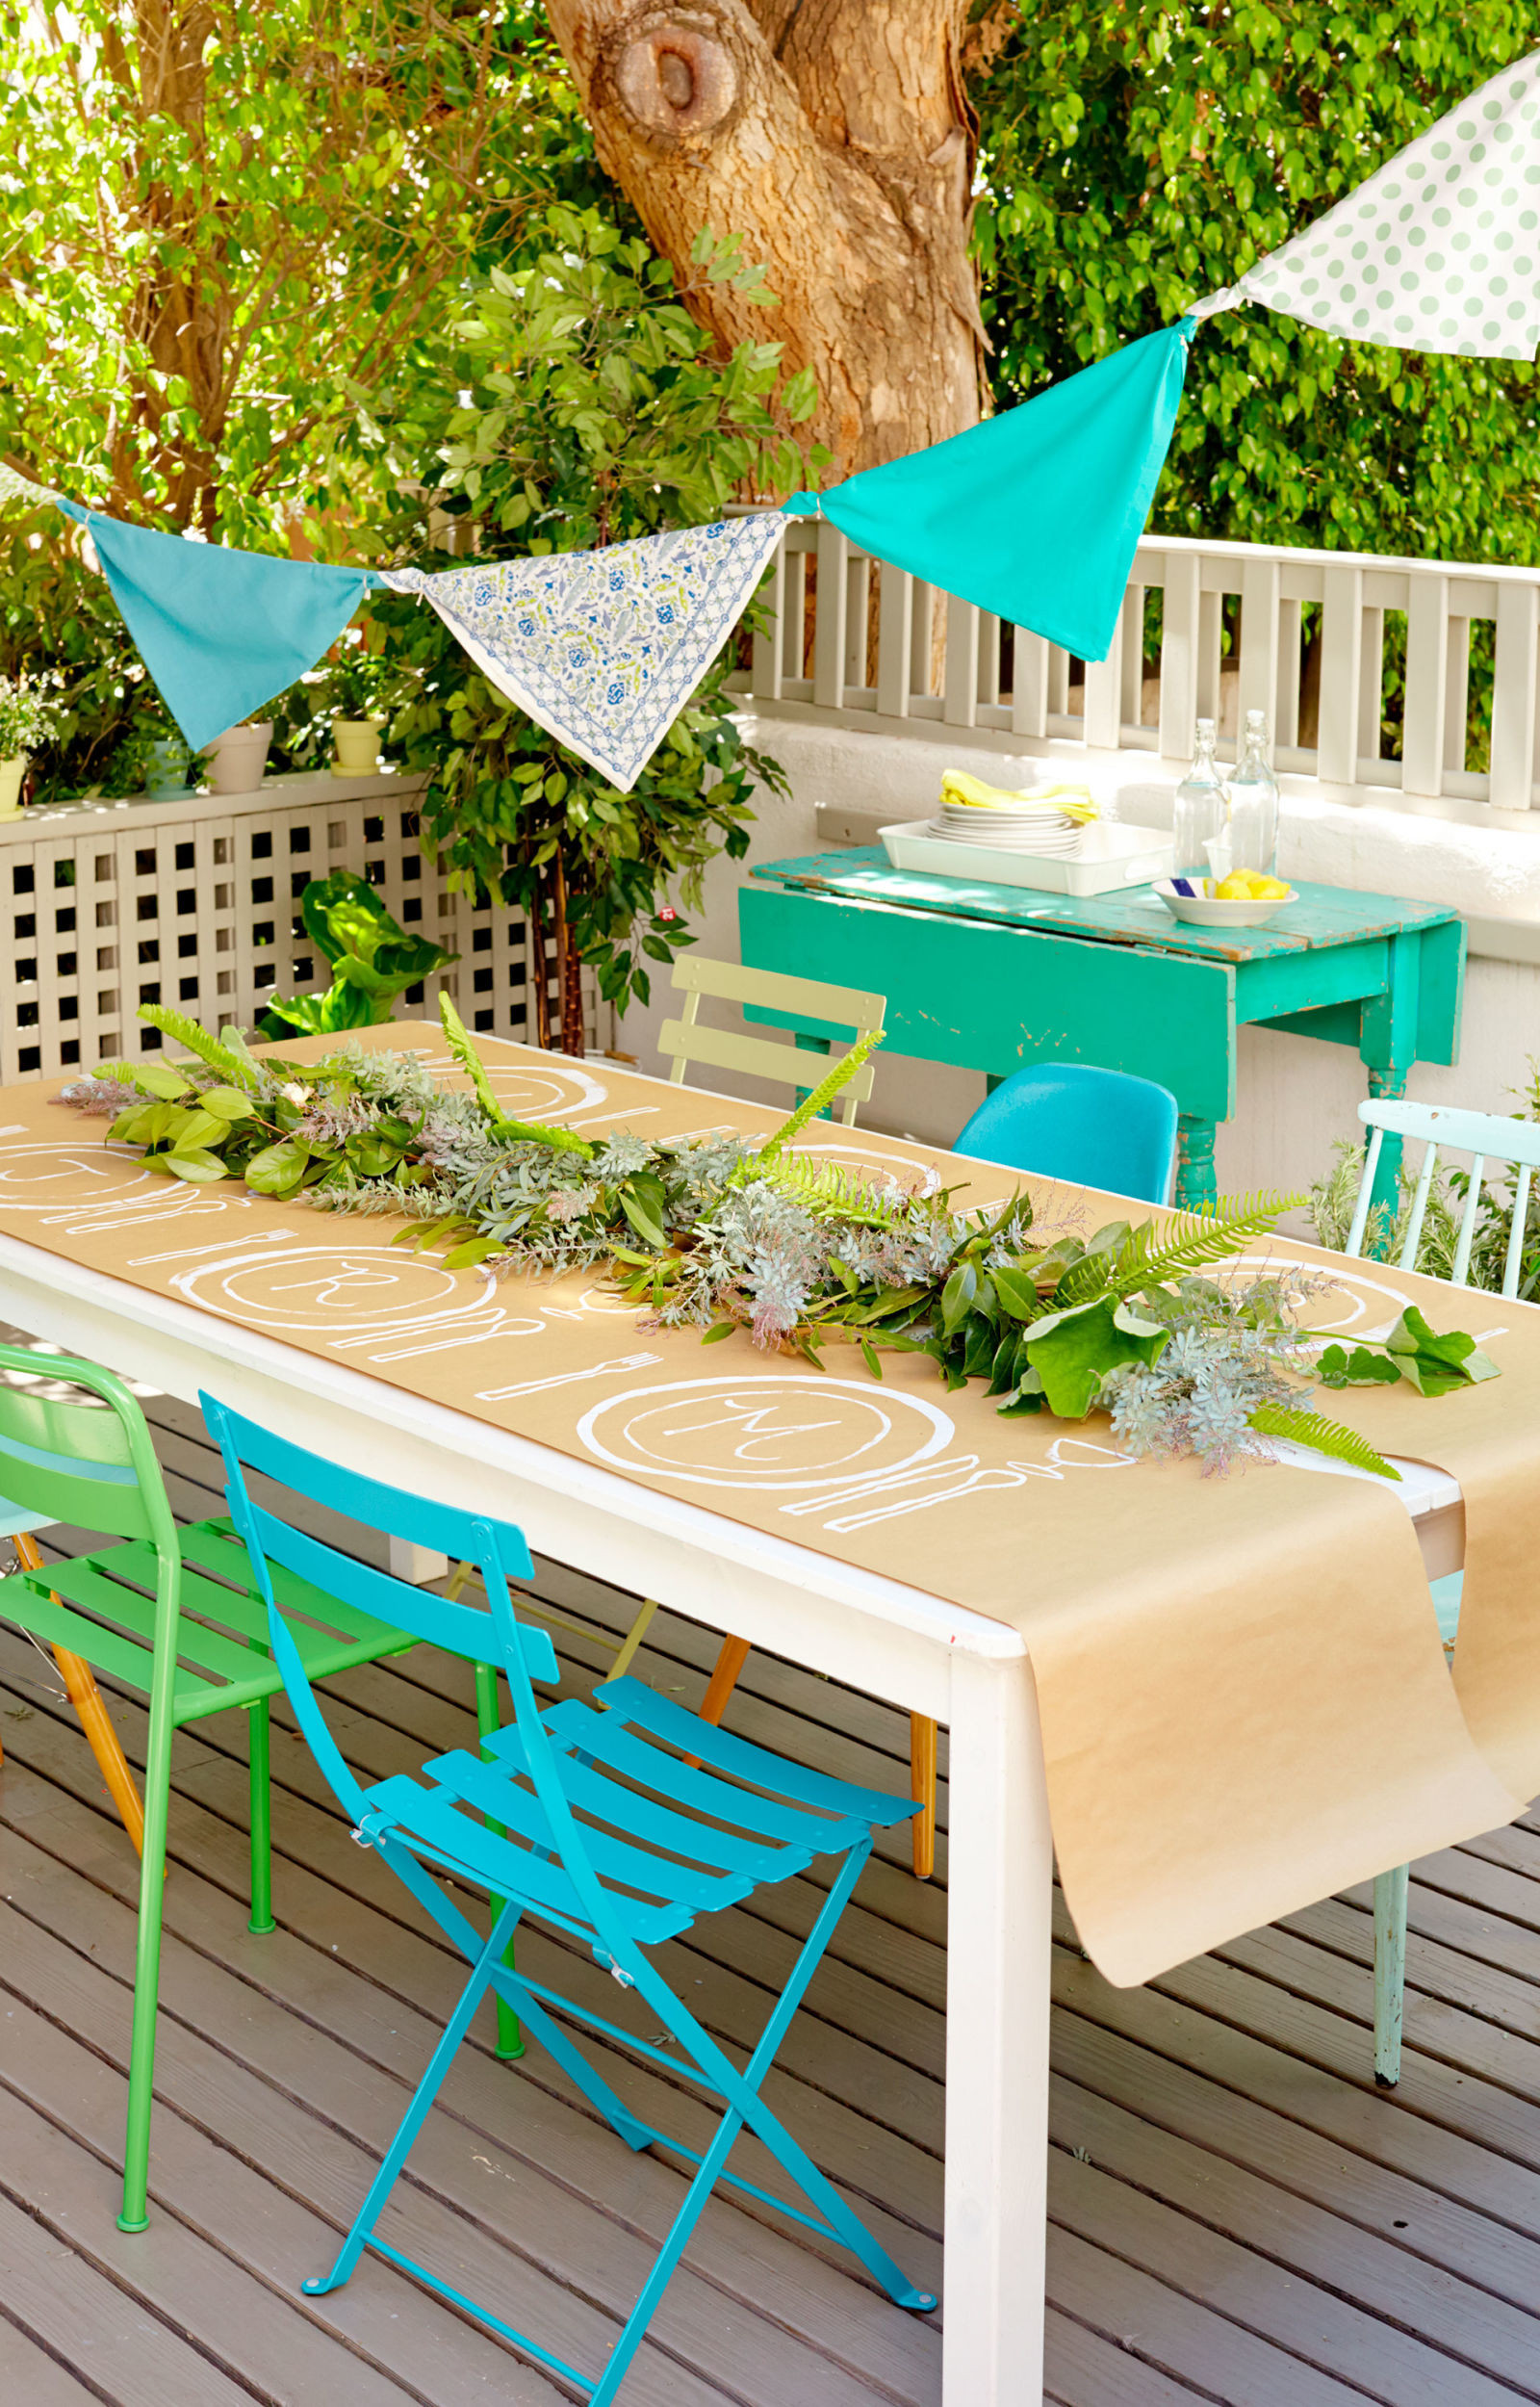 Backyard Summer Party Decorating Ideas  Backyard Party Ideas And Decor Summer Entertaining Ideas